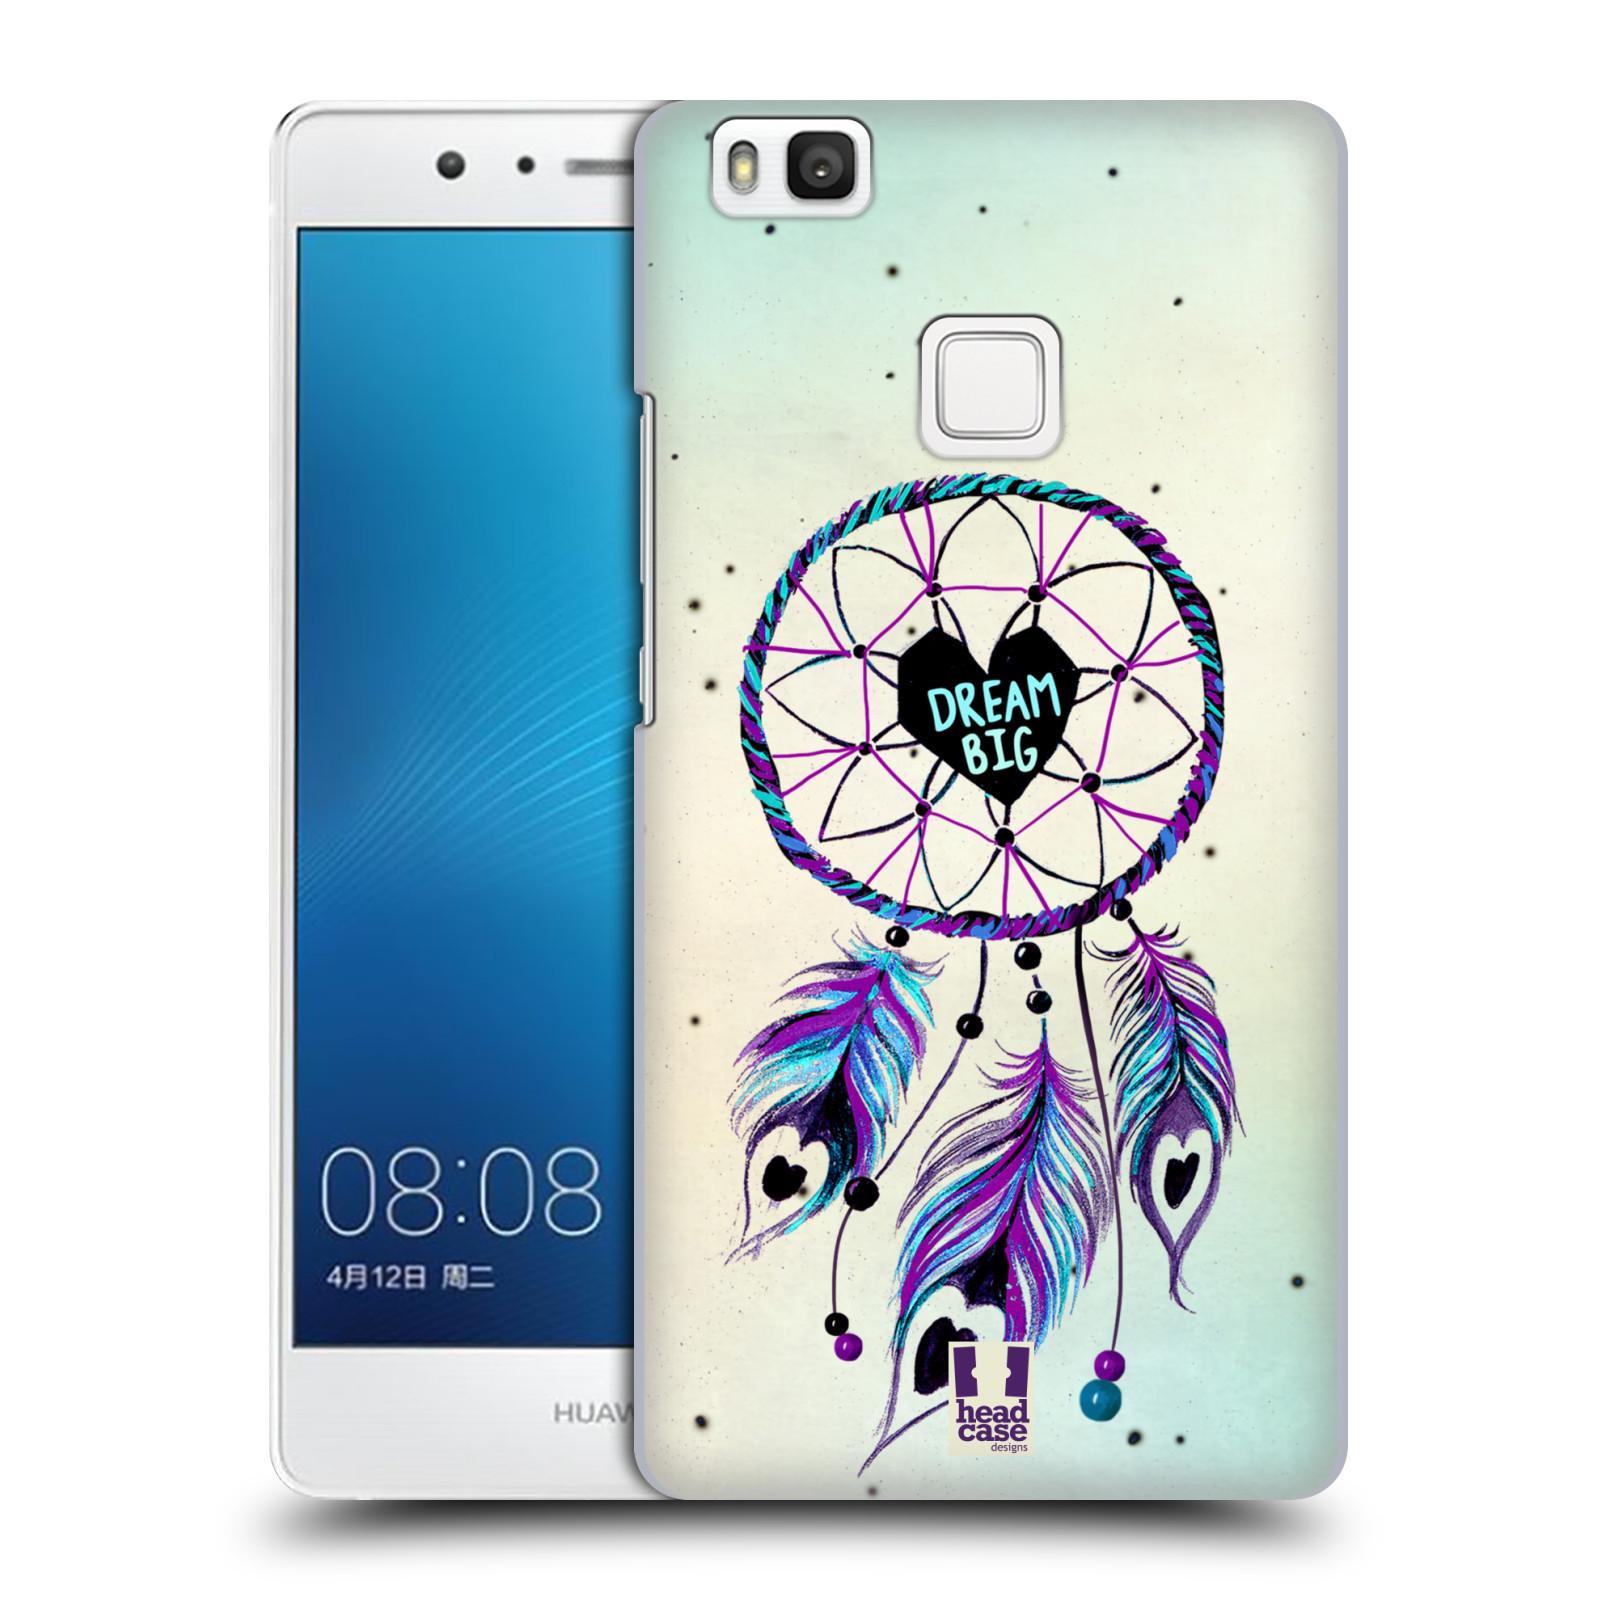 Plastové pouzdro na mobil Huawei P9 Lite HEAD CASE Lapač Assorted Dream Big Srdce